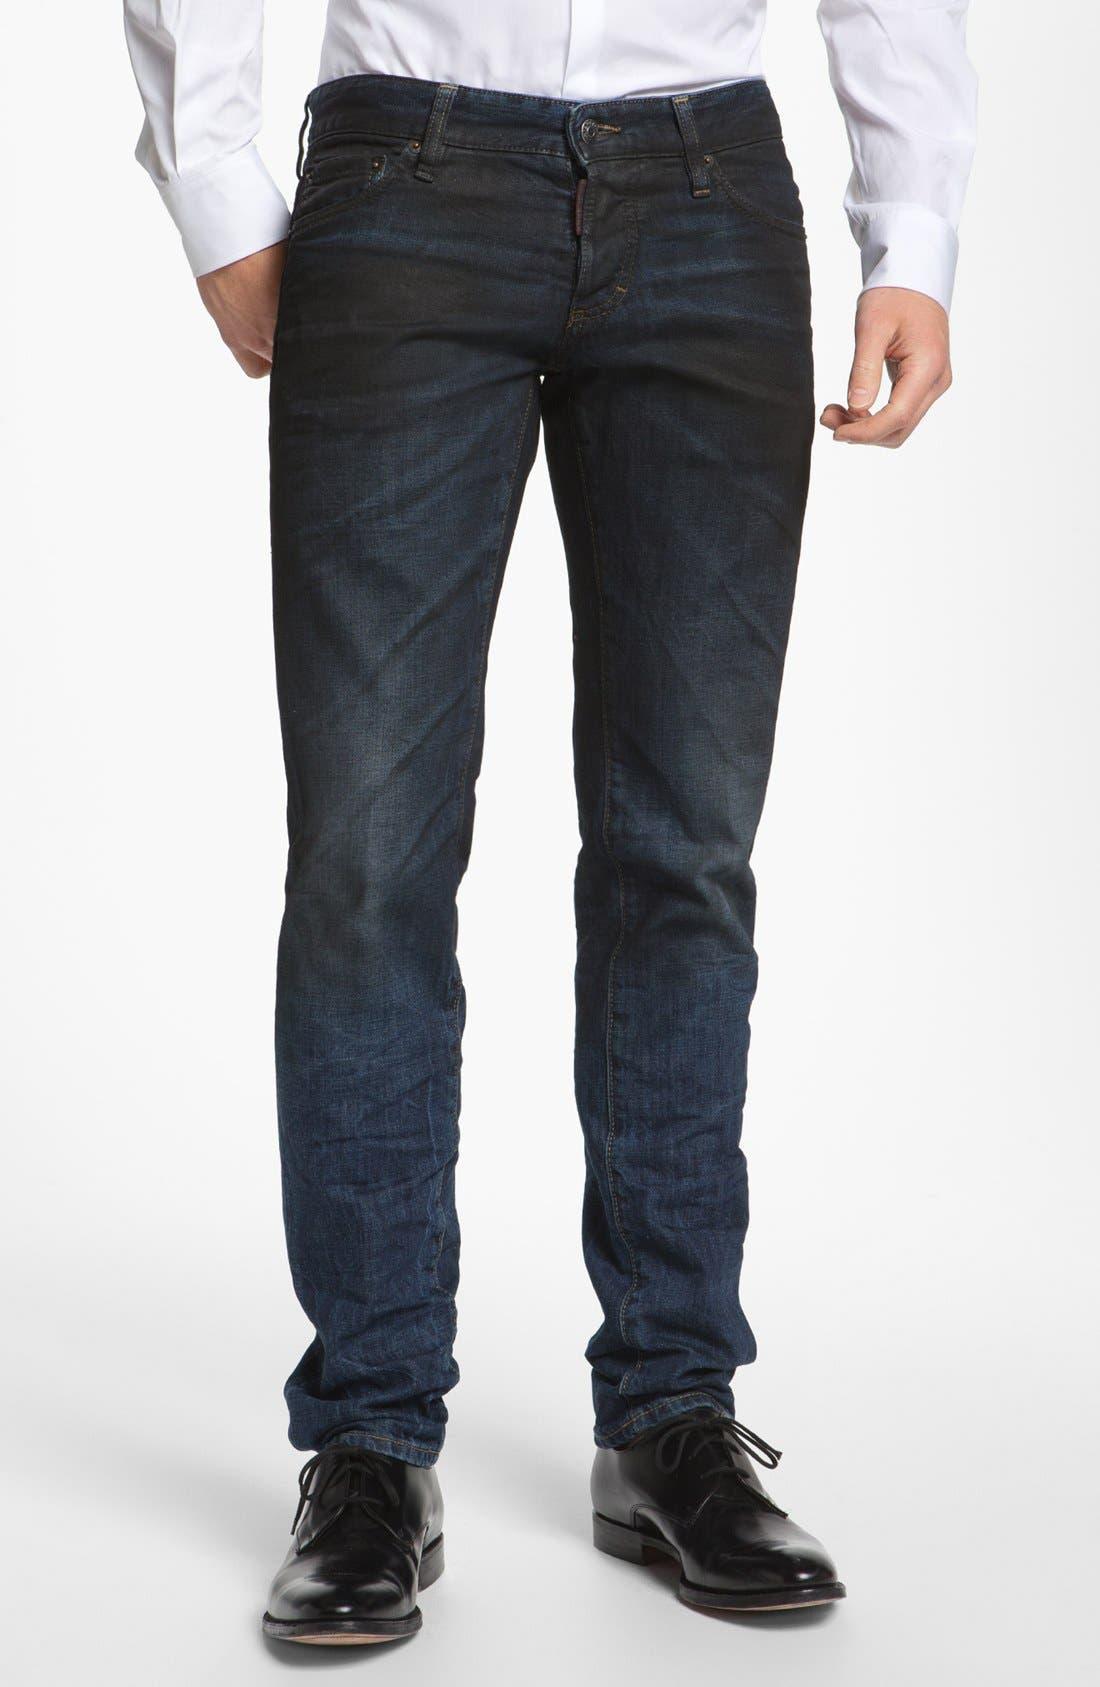 Alternate Image 1 Selected - Dsquared2 Slim Fit Jeans (Blue)